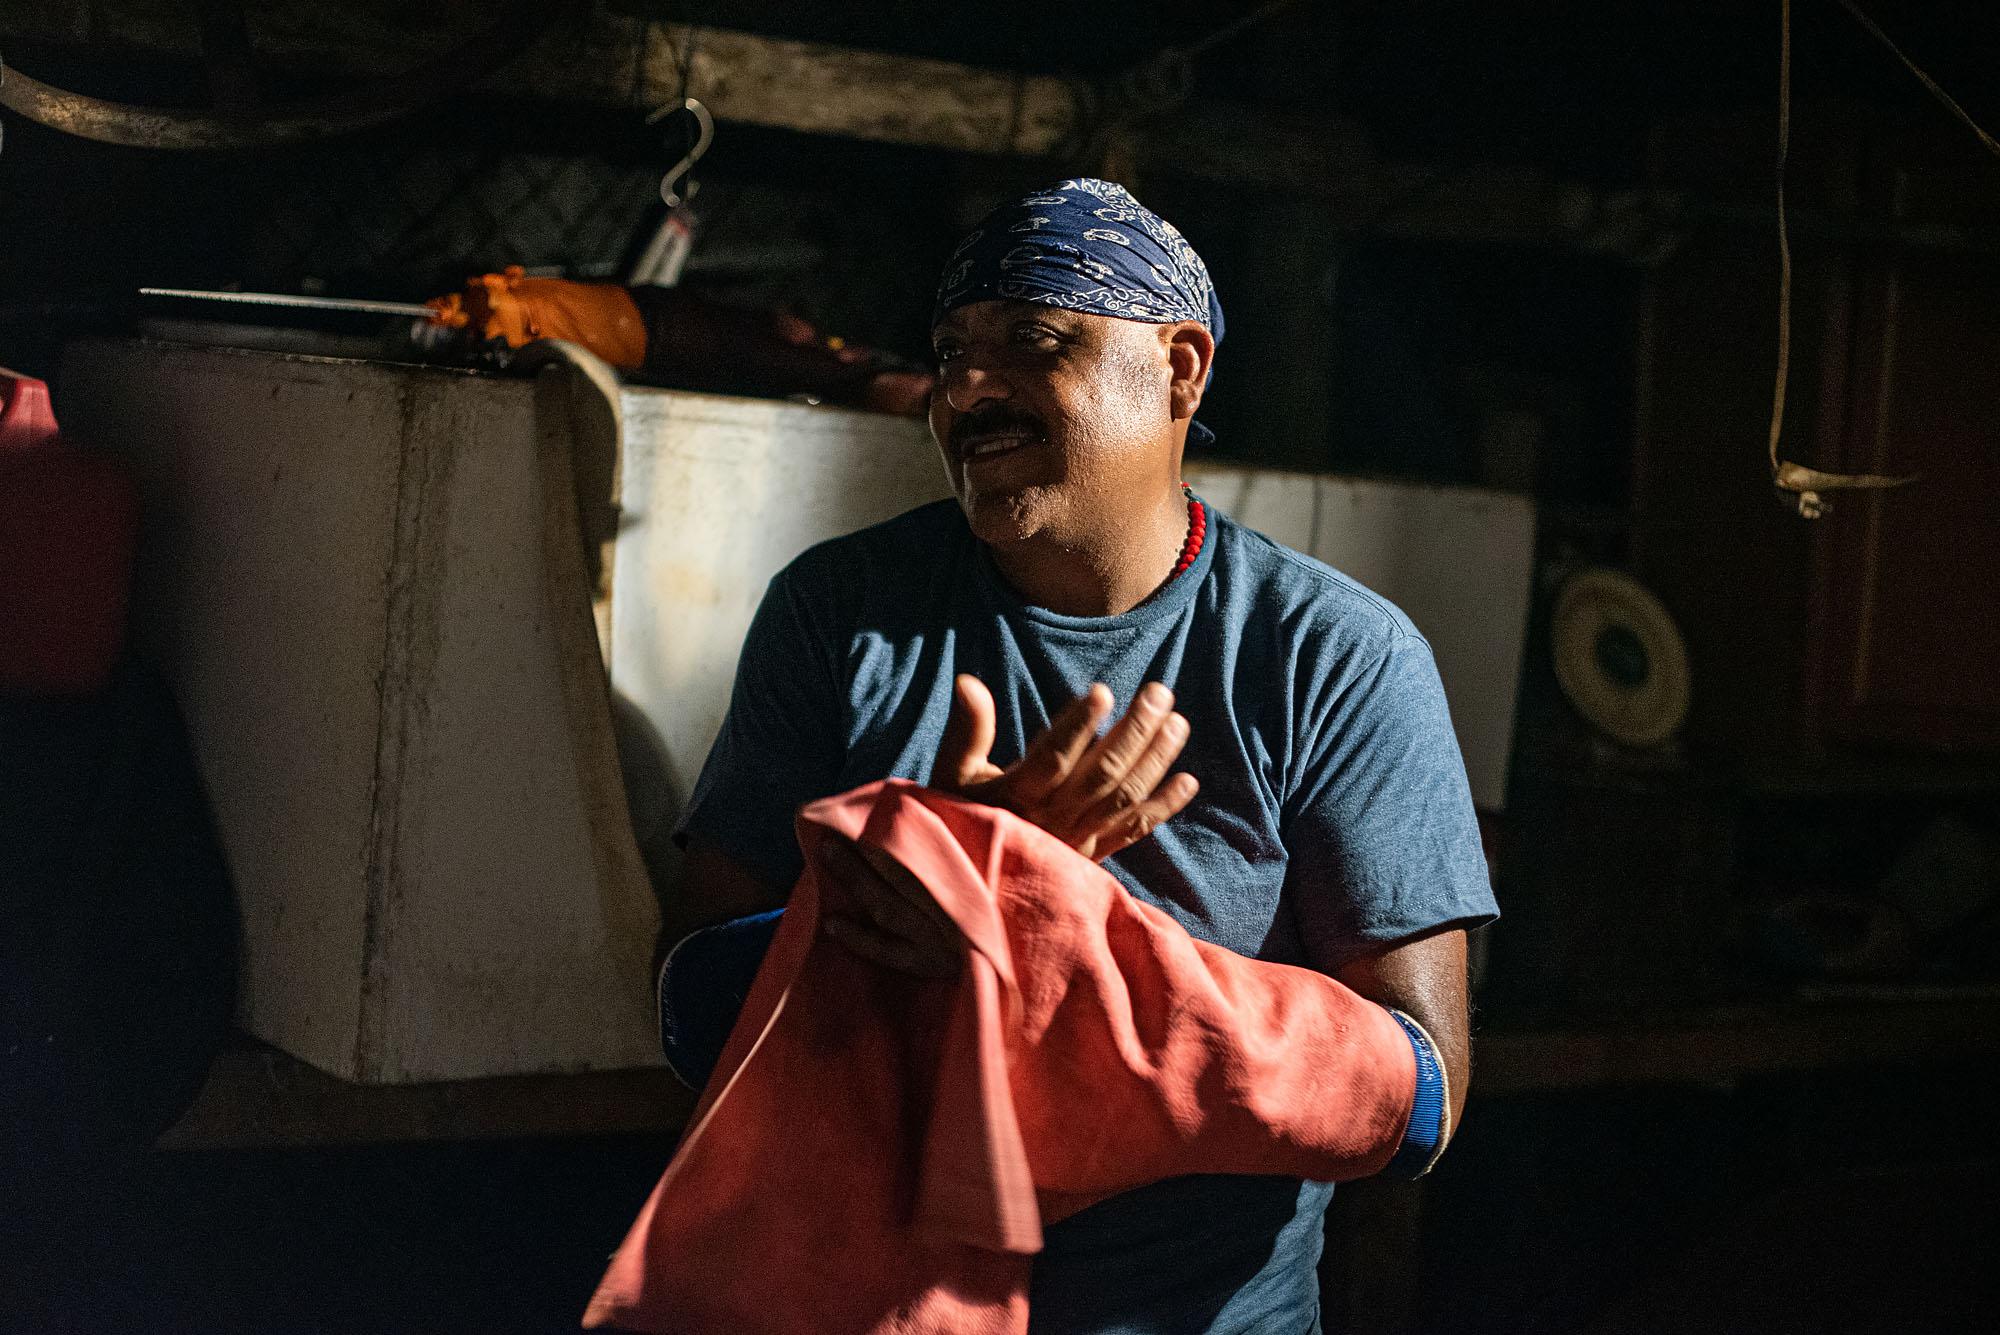 Gonzalo Ramirez, a barbacoa master, in his farm in Pixley, California.